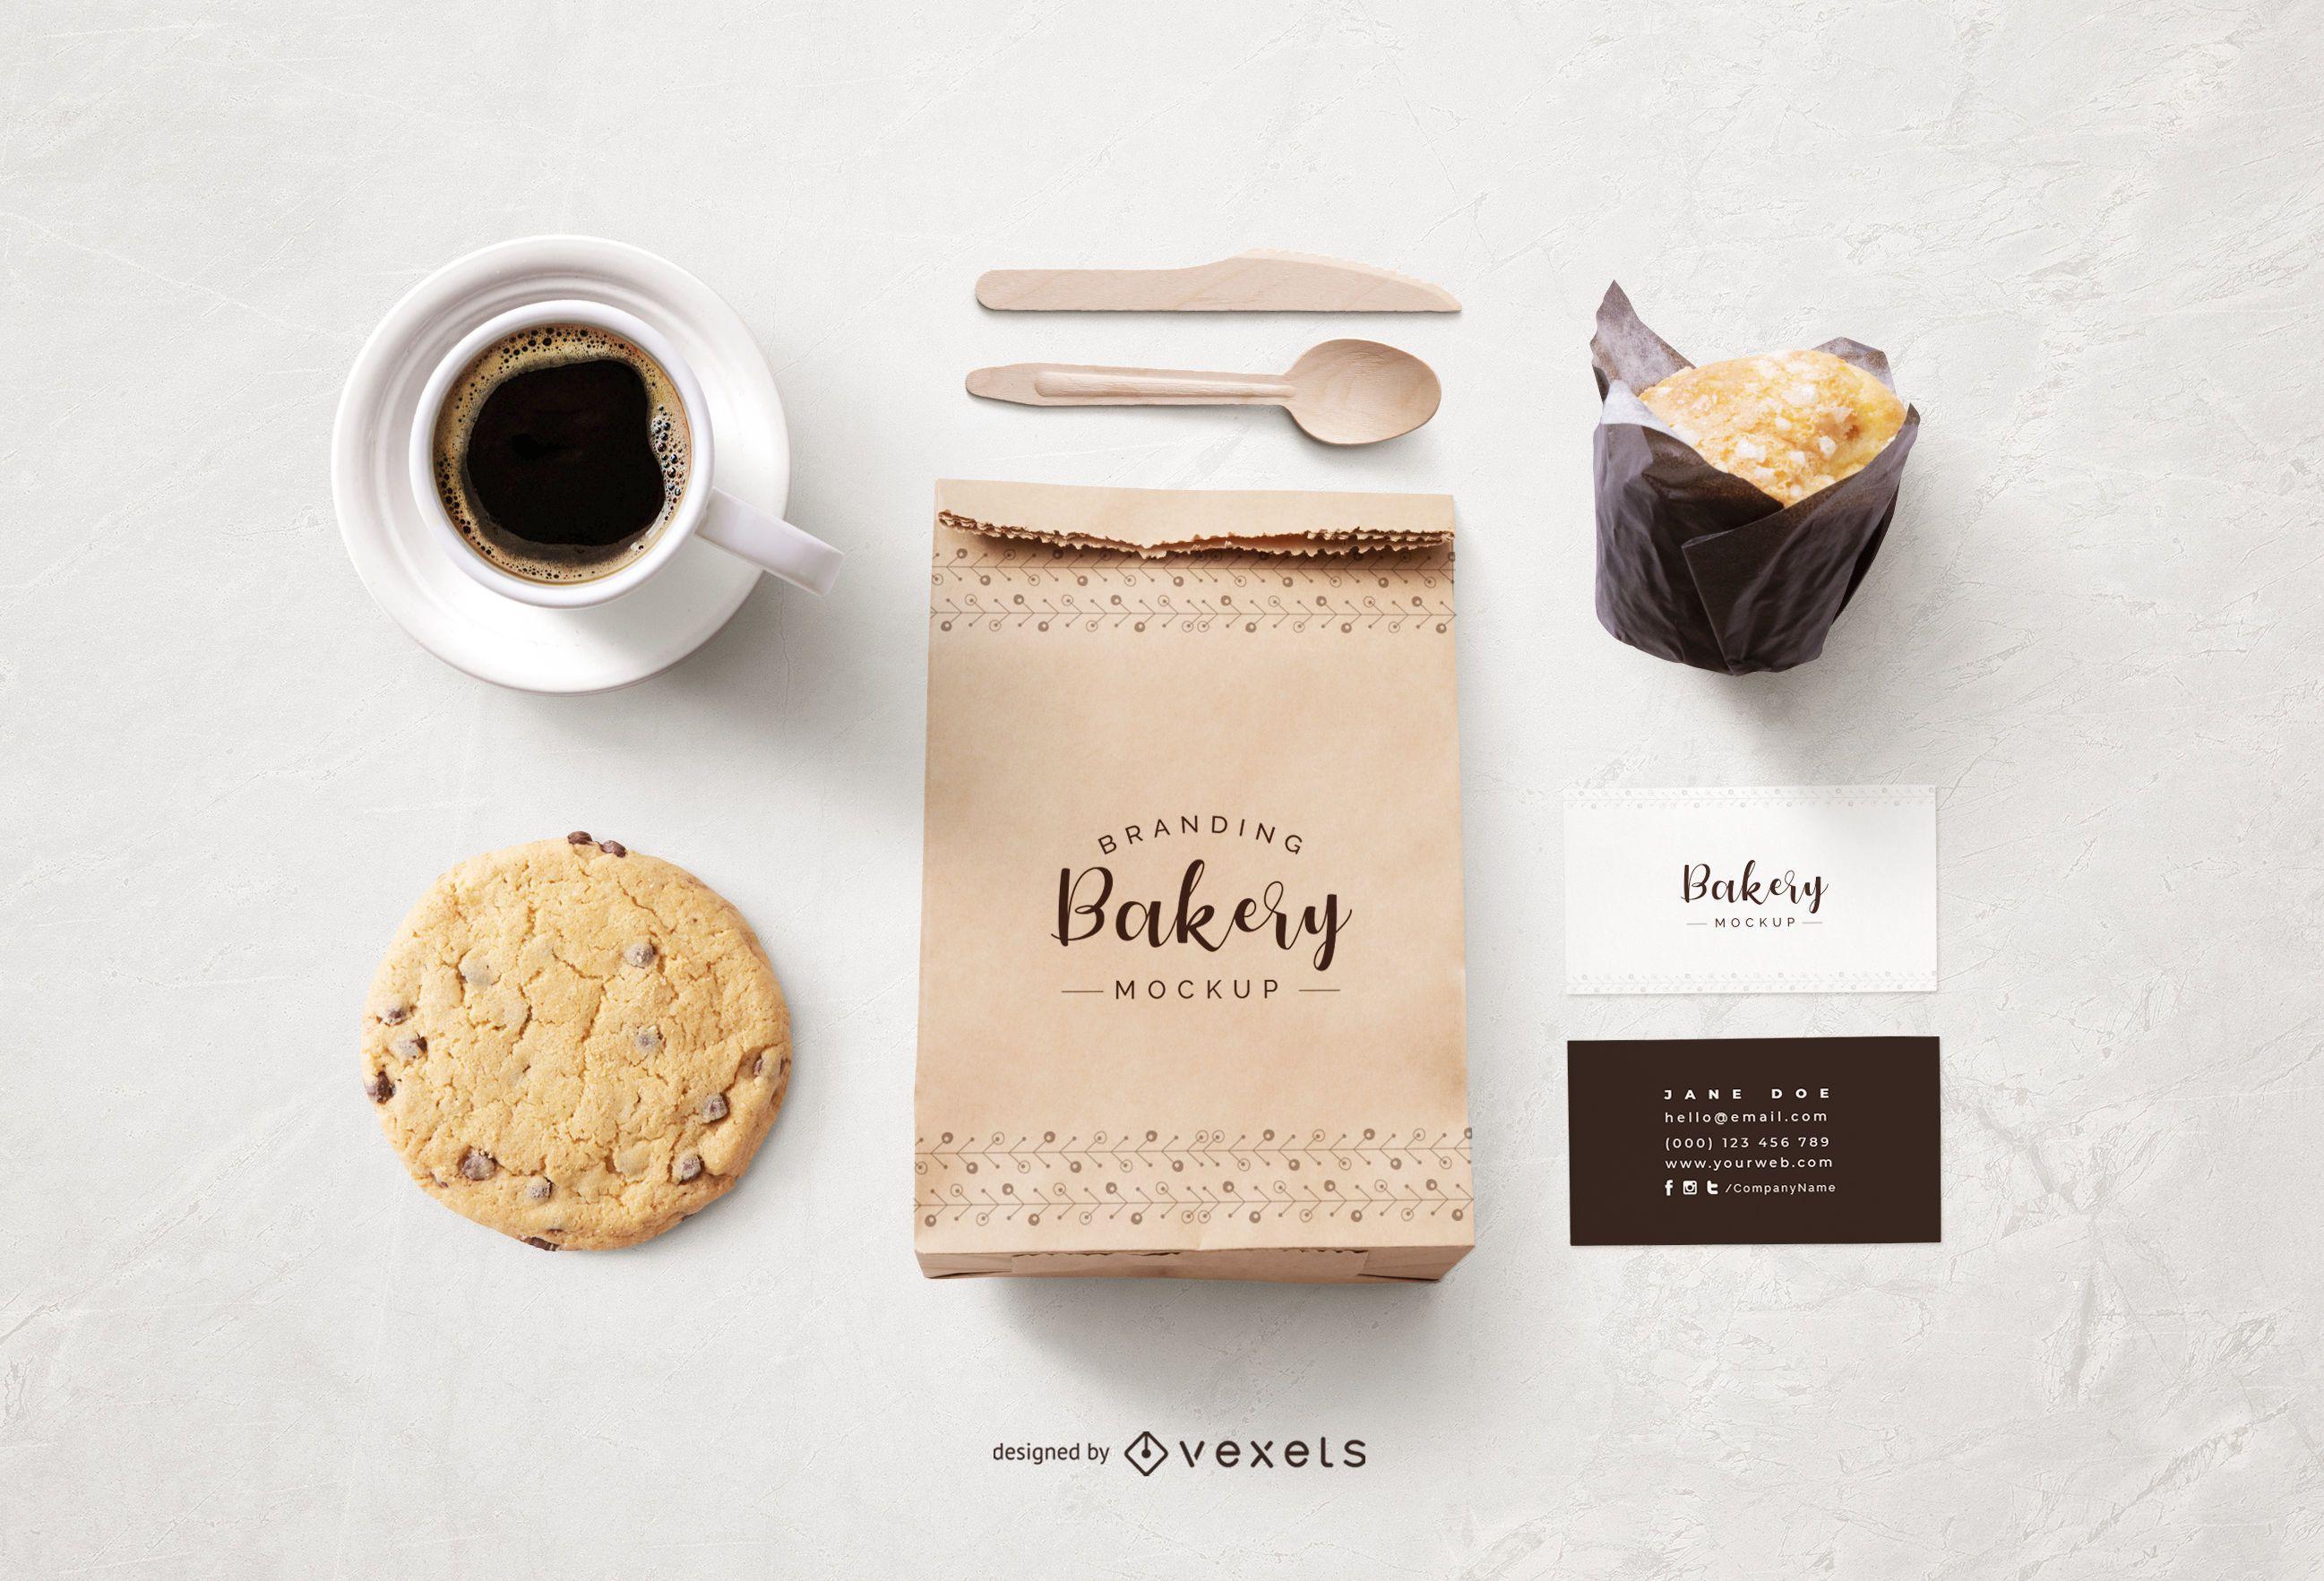 Bakery Paper Bag and Stationery Mockup Design